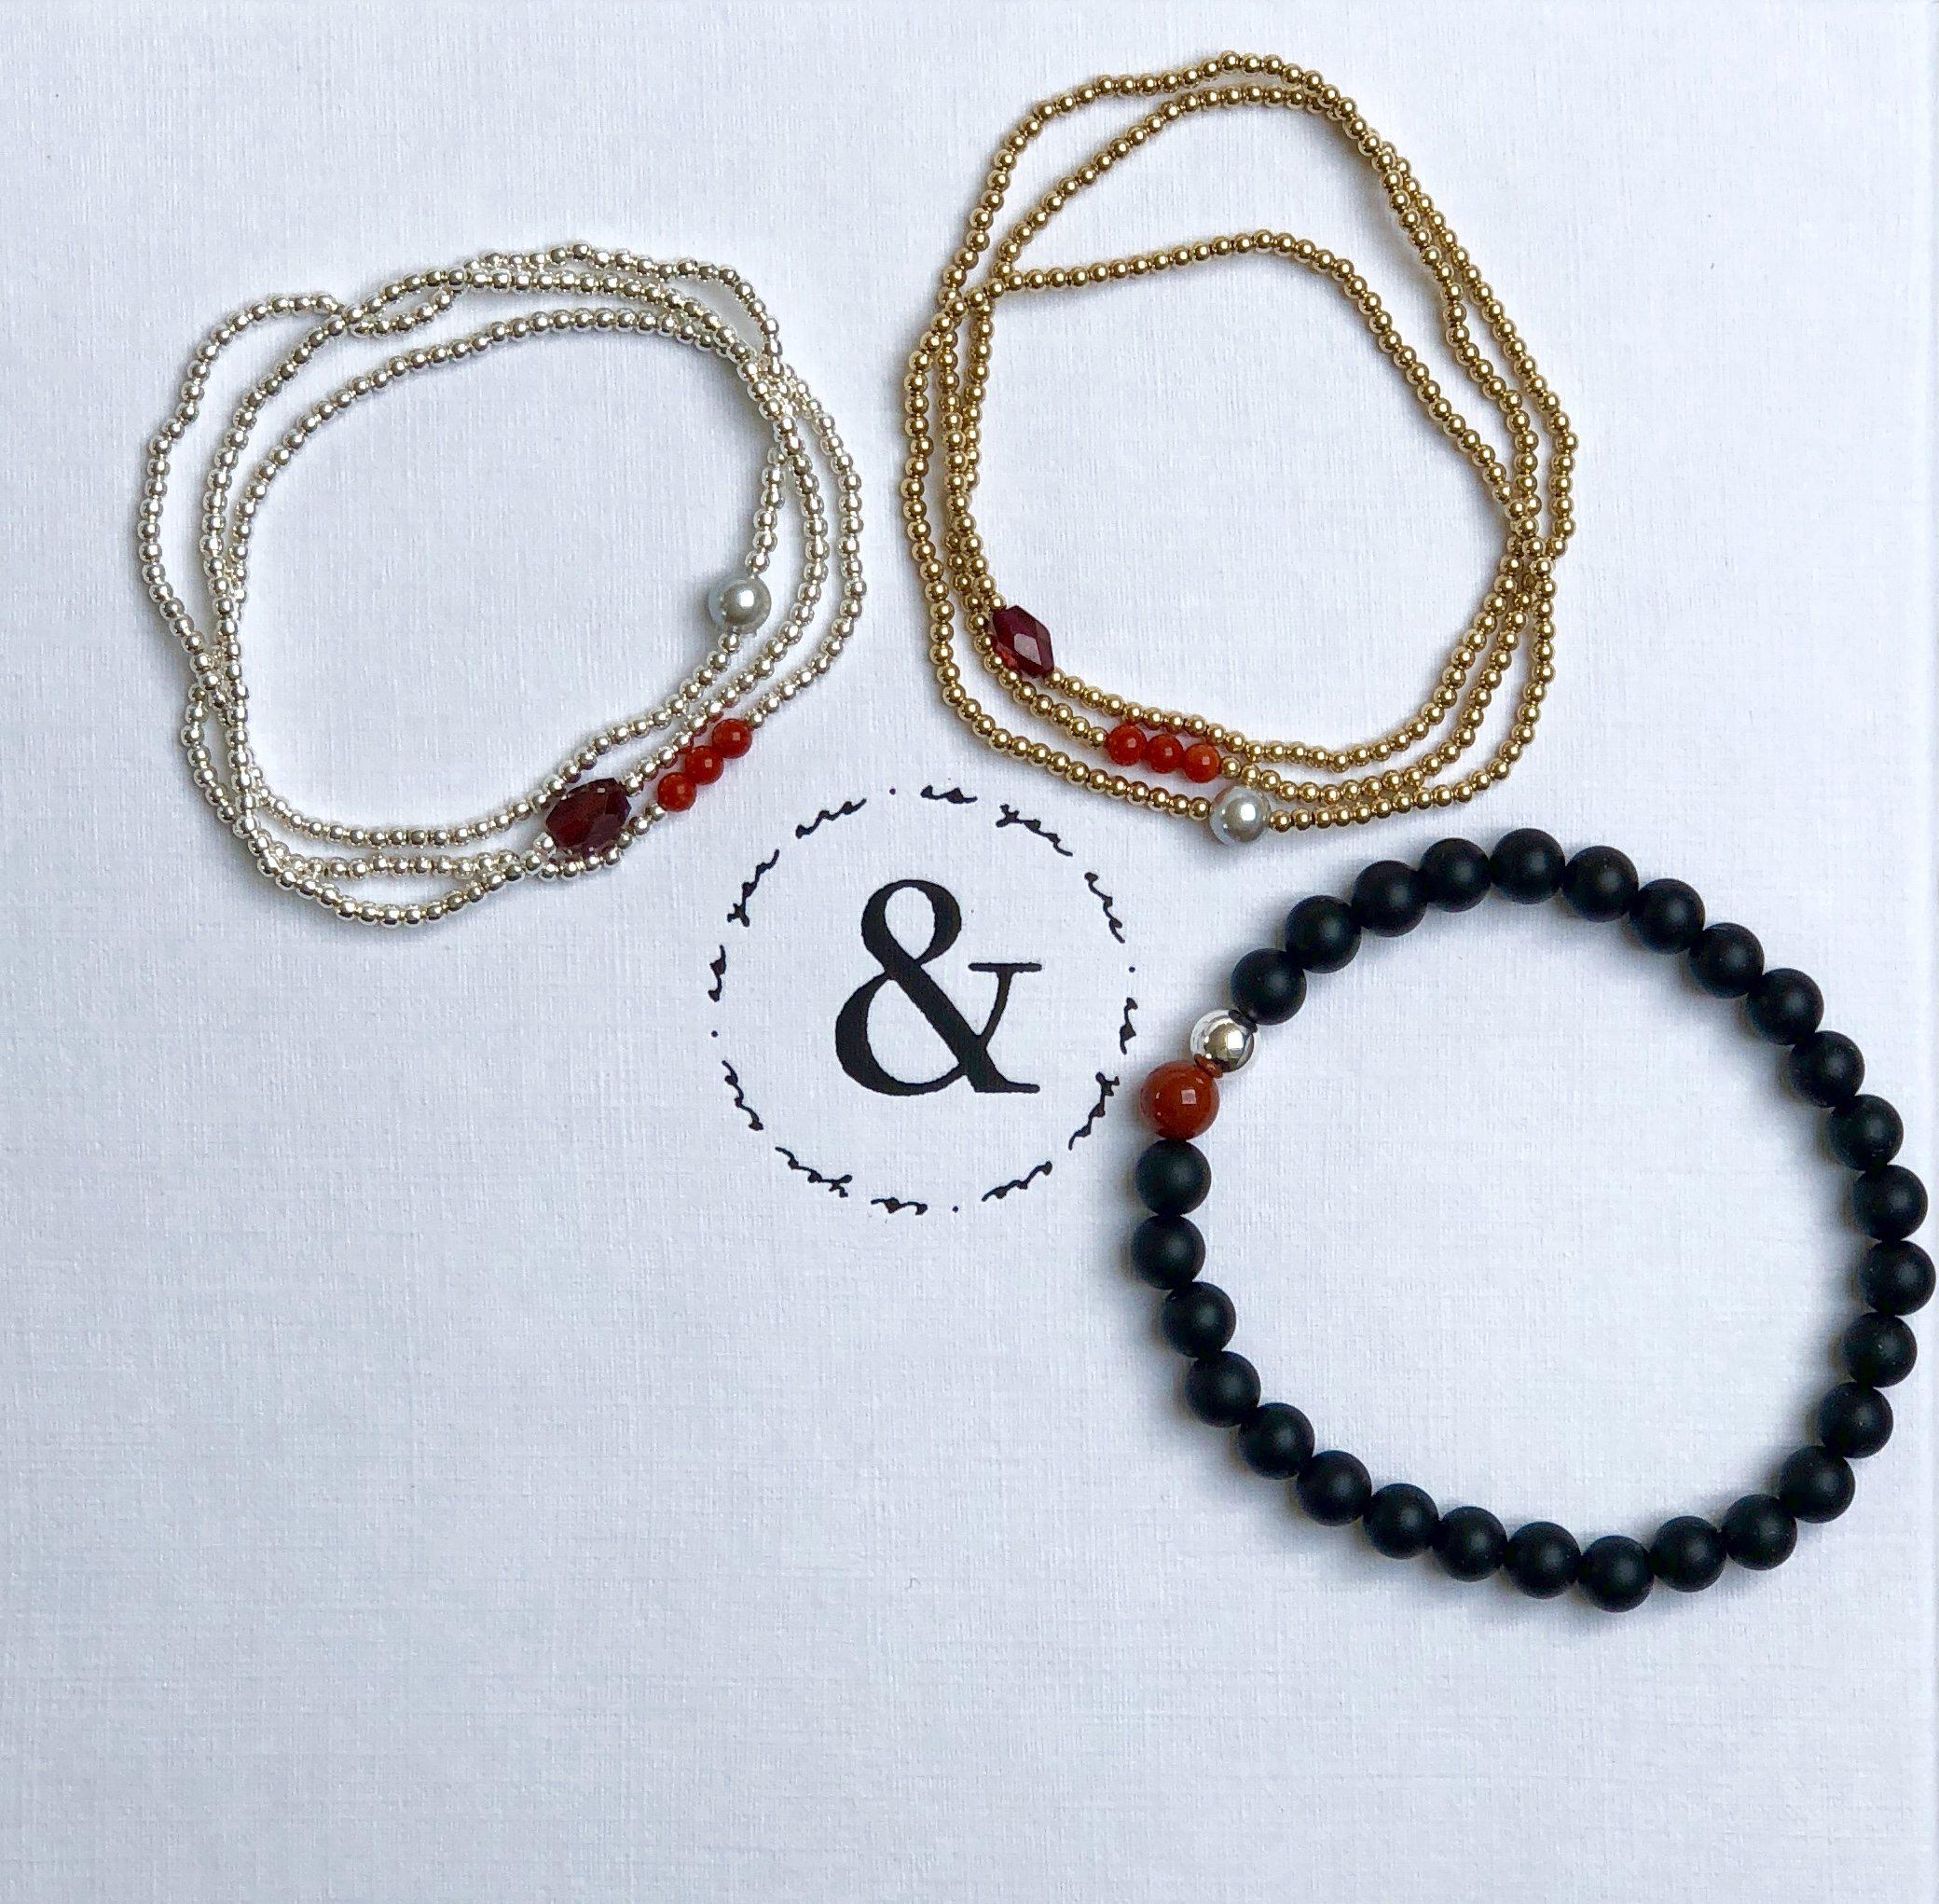 Indy & Noa bracelet sets for the Future